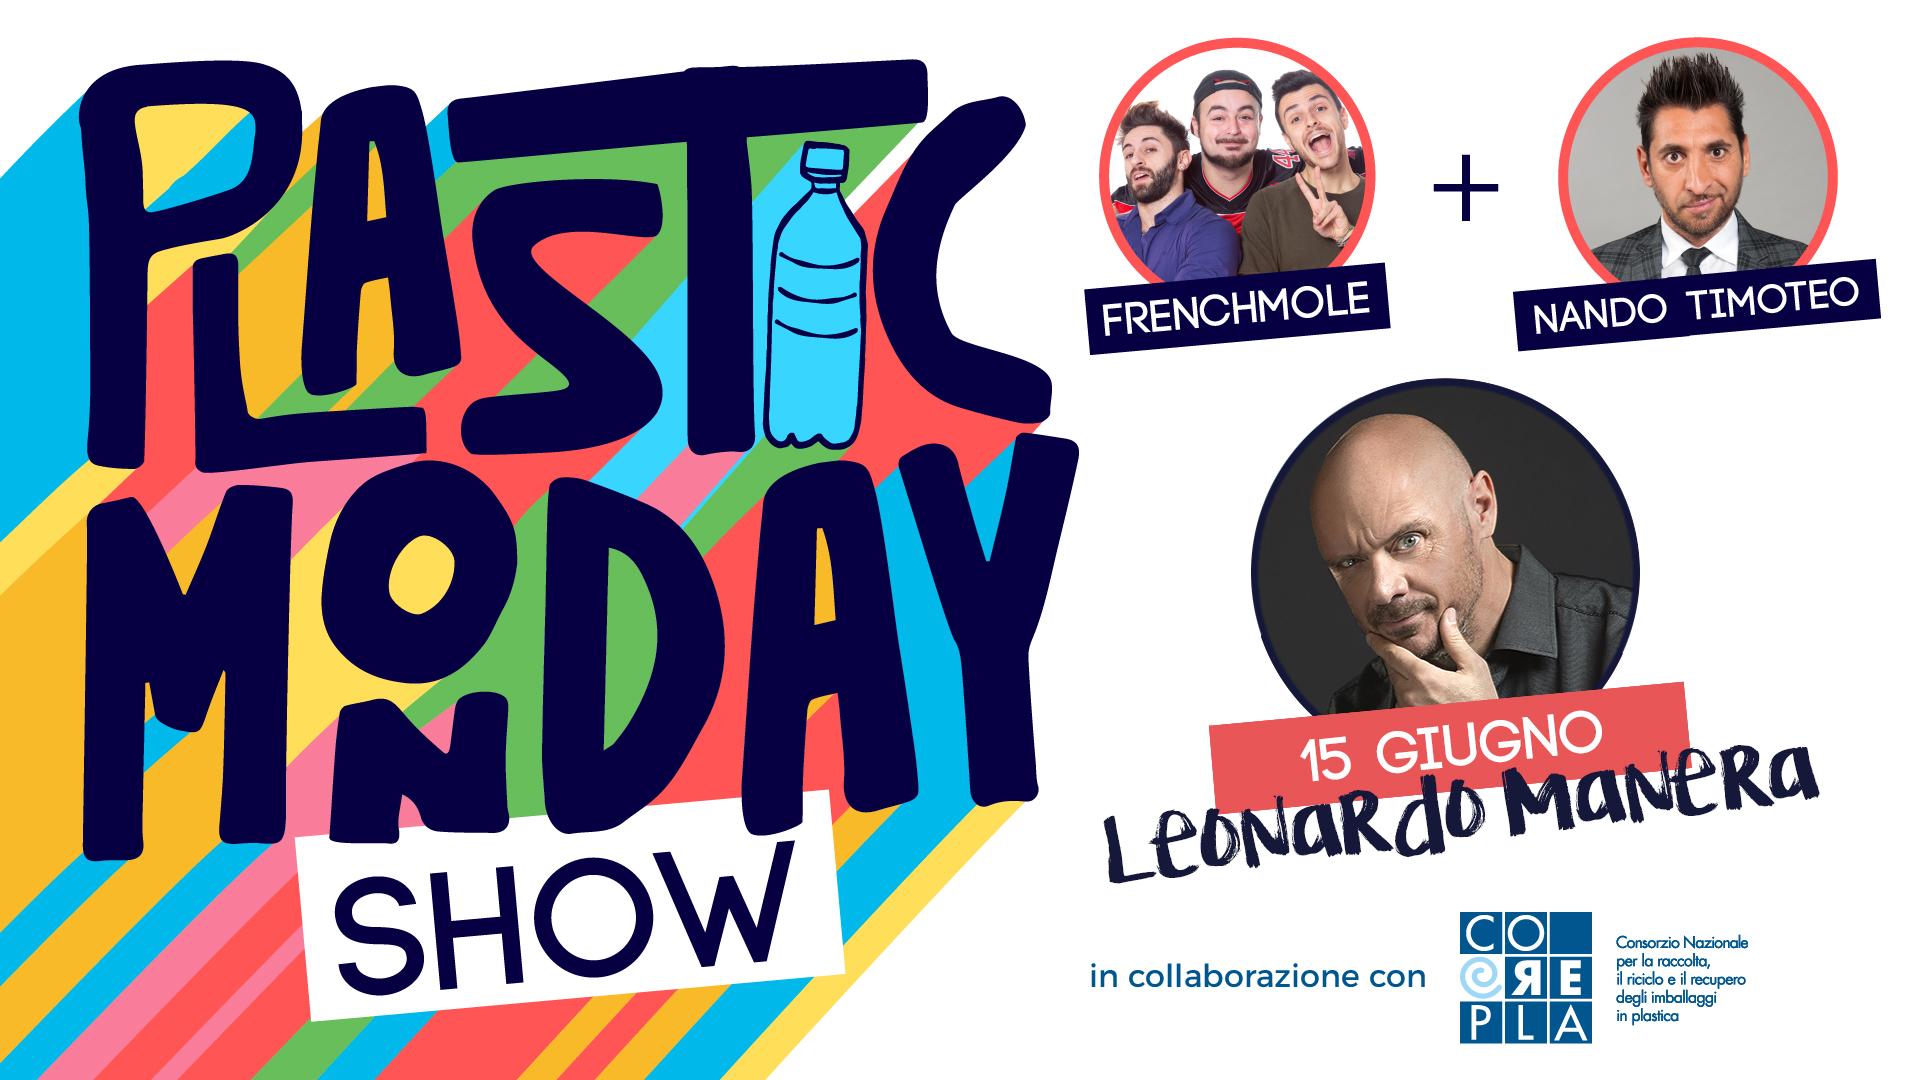 Plastic Monday Show 15 giugno